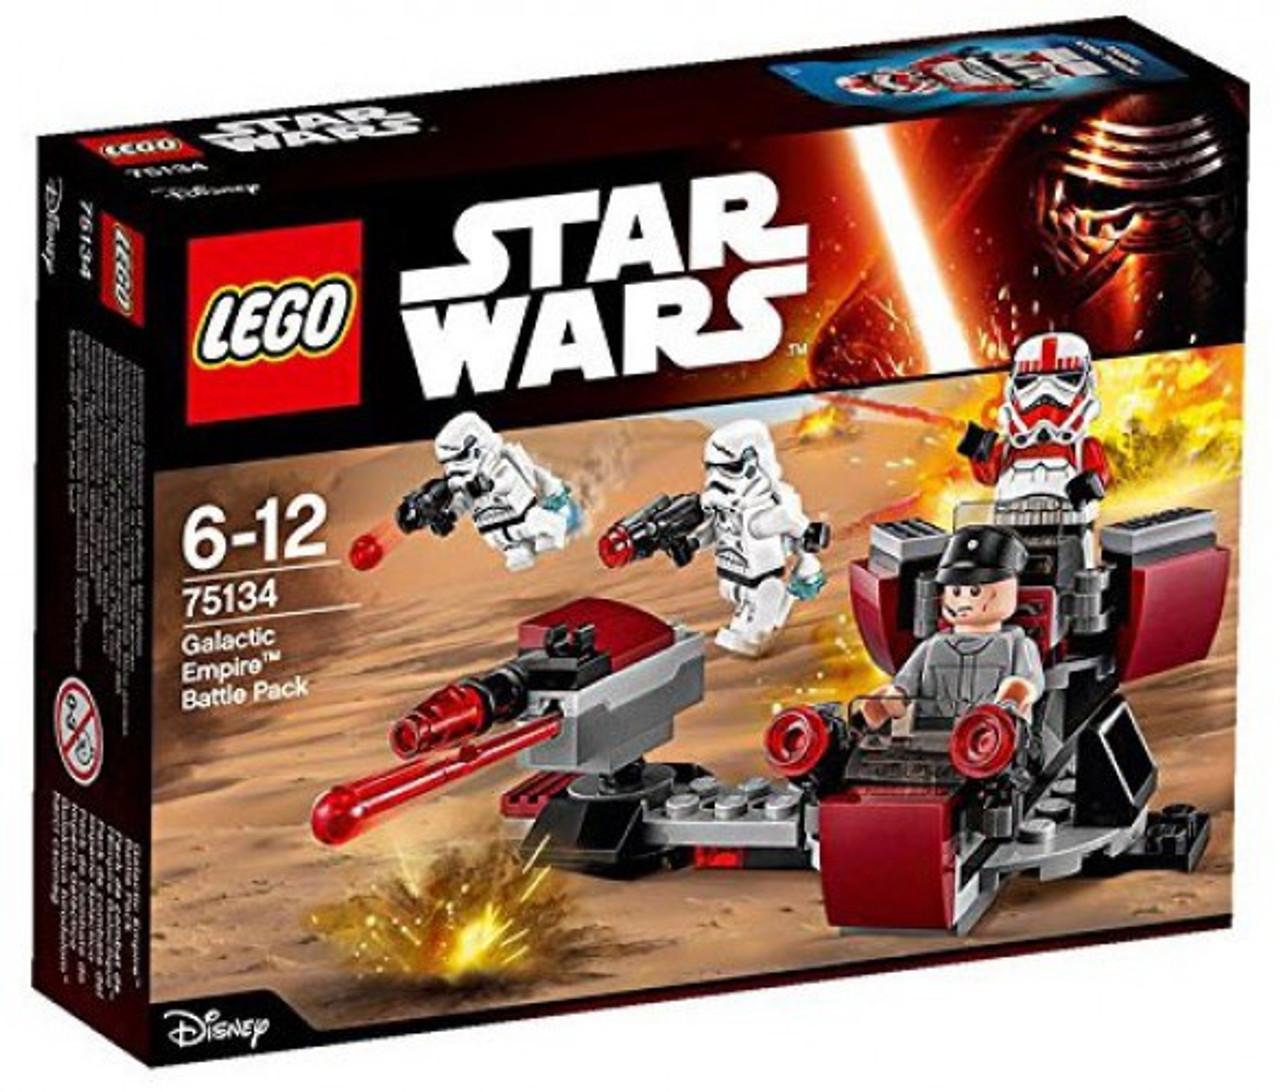 LEGO Star Wars Set 75151 75157 Clone Turbo Tank Captain Rex/'s AT-TE Darth N16//8